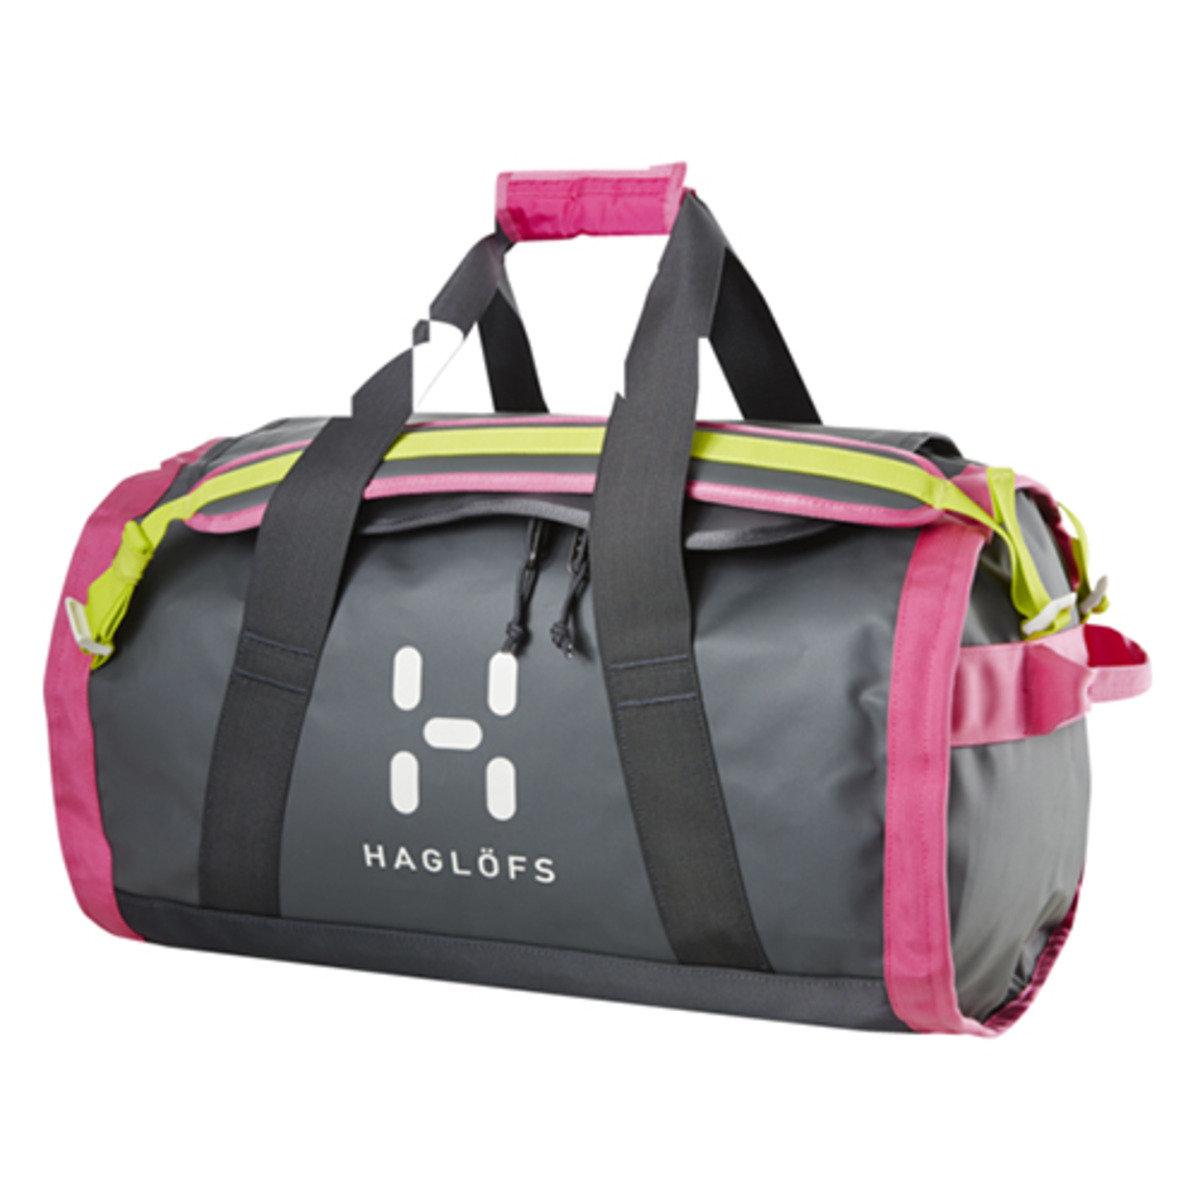 Lava Legend 50 - 2 合1 旅行袋